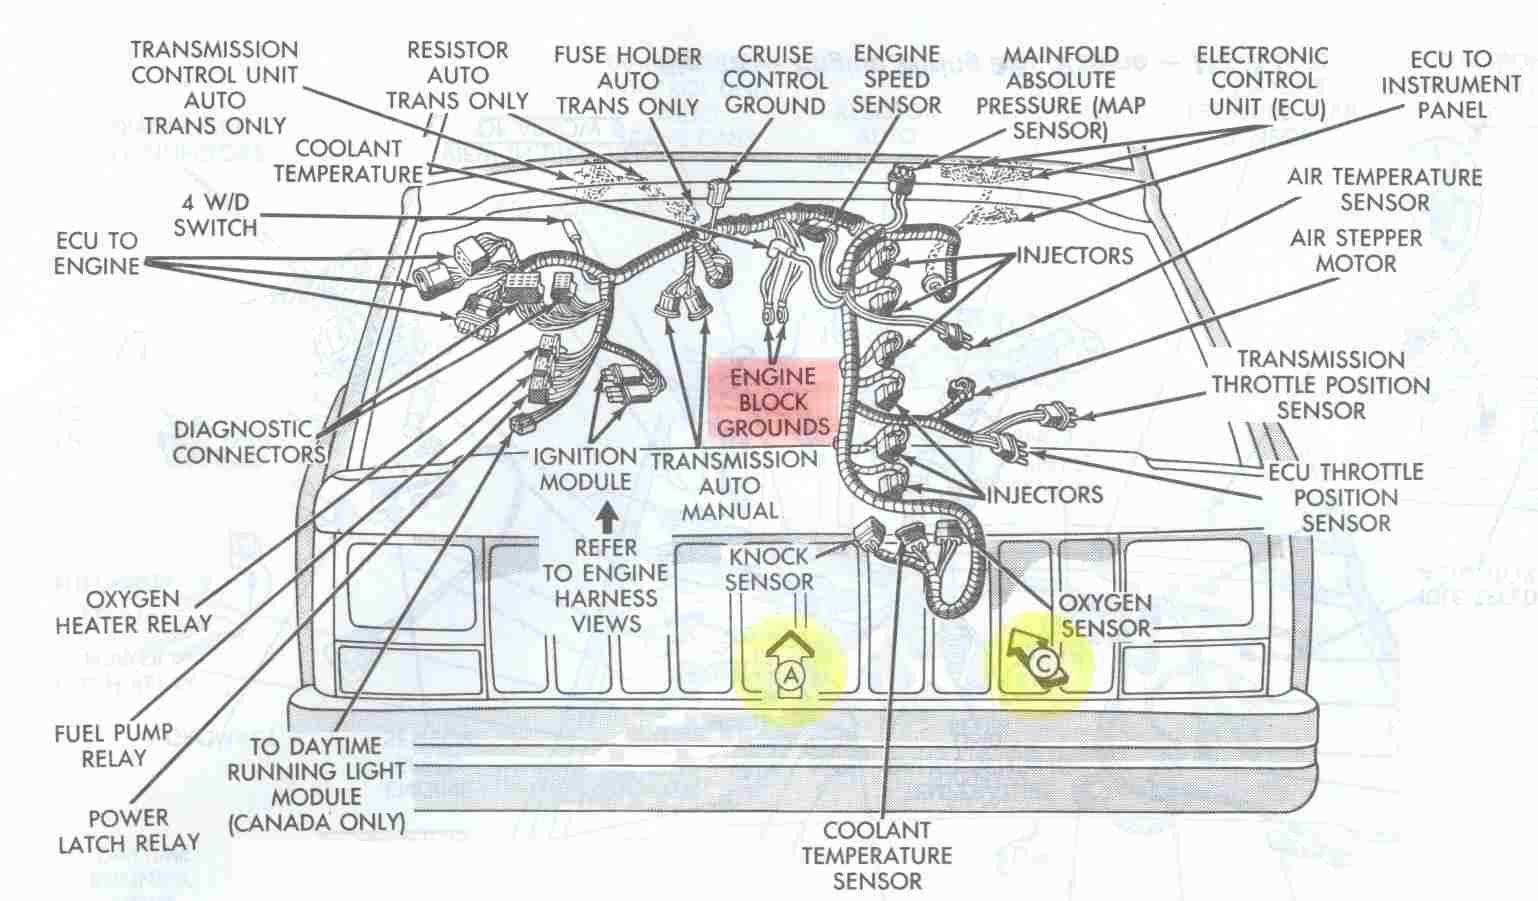 Awesome 1996 Jeep Cherokee Engine Diagram Wiring Diagram Database Wiring Cloud Monangrecoveryedborg